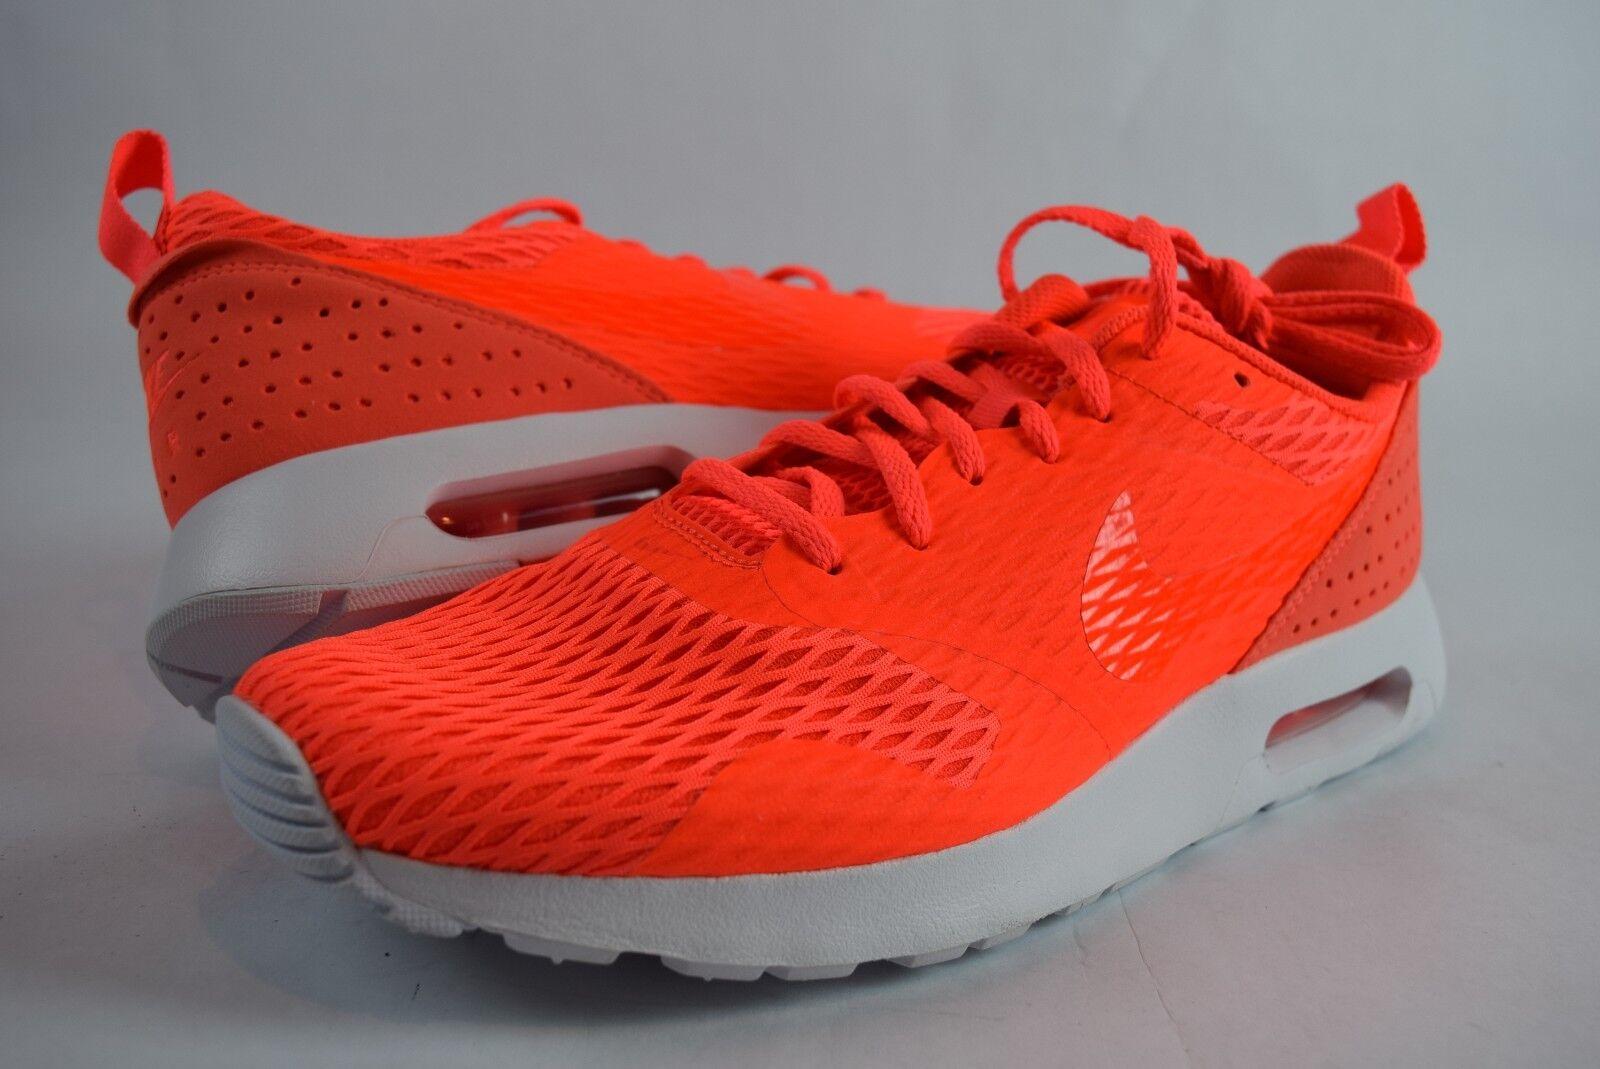 New Mens Nike Air Max Tavas SE Special Edition 718895 800 SZ 11.5 Crimson shoes